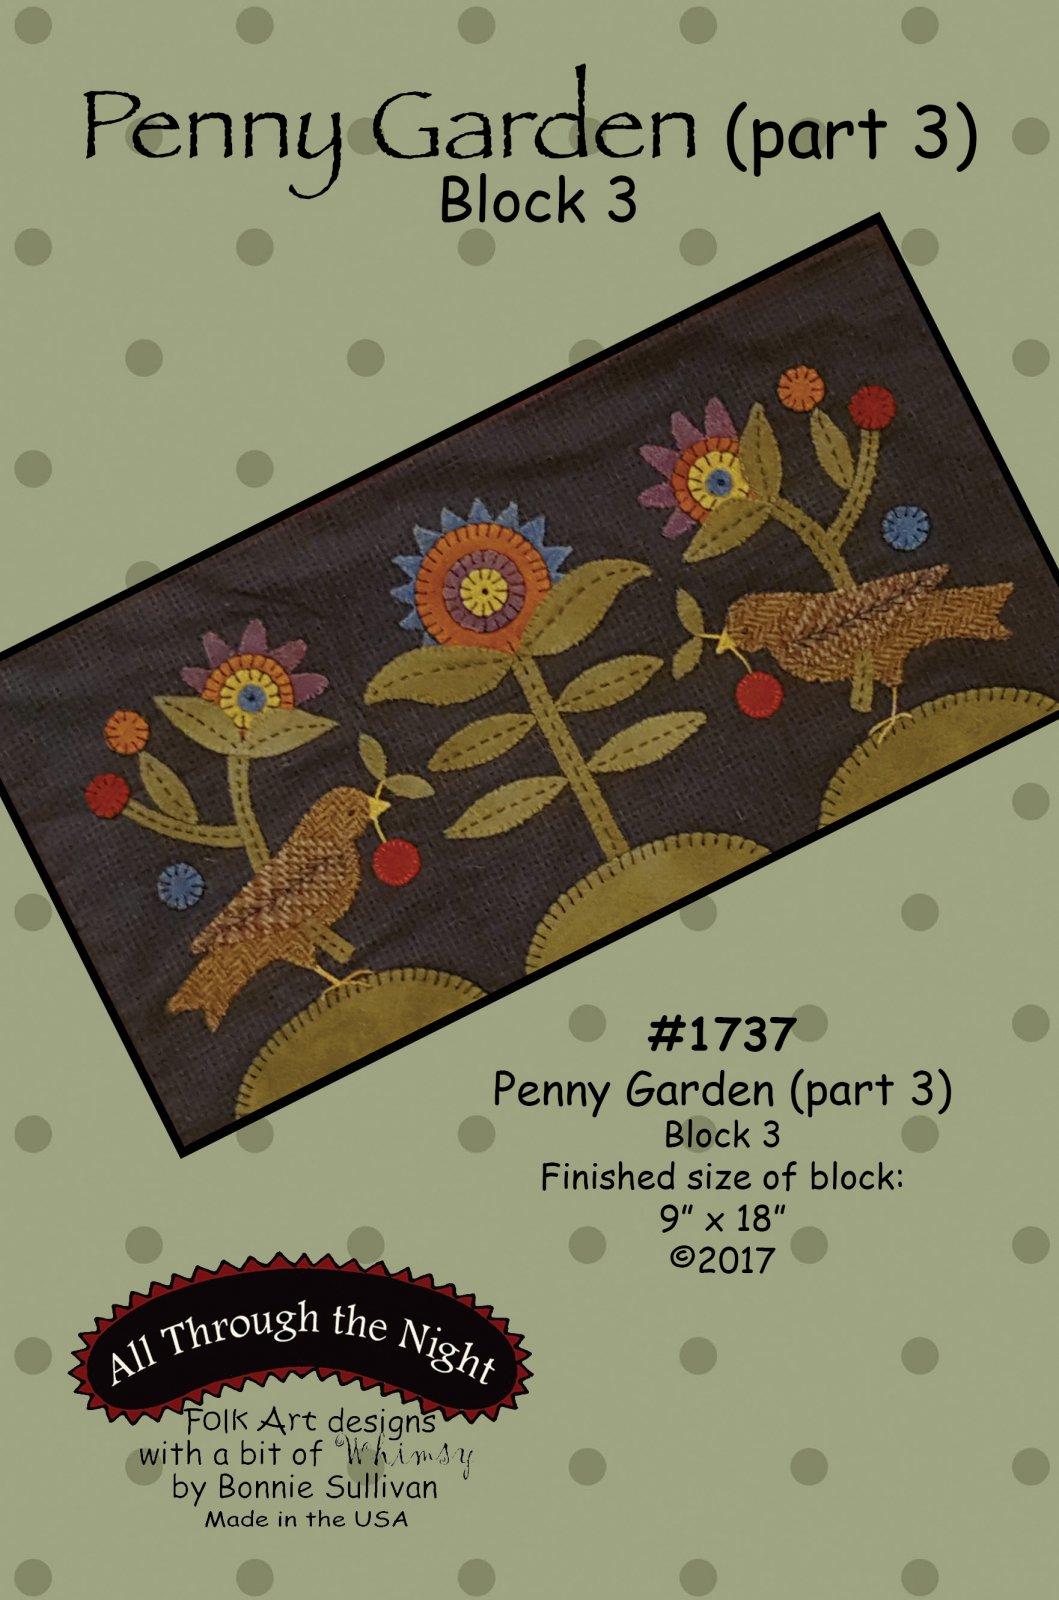 1737 Penny Garden (part 3)